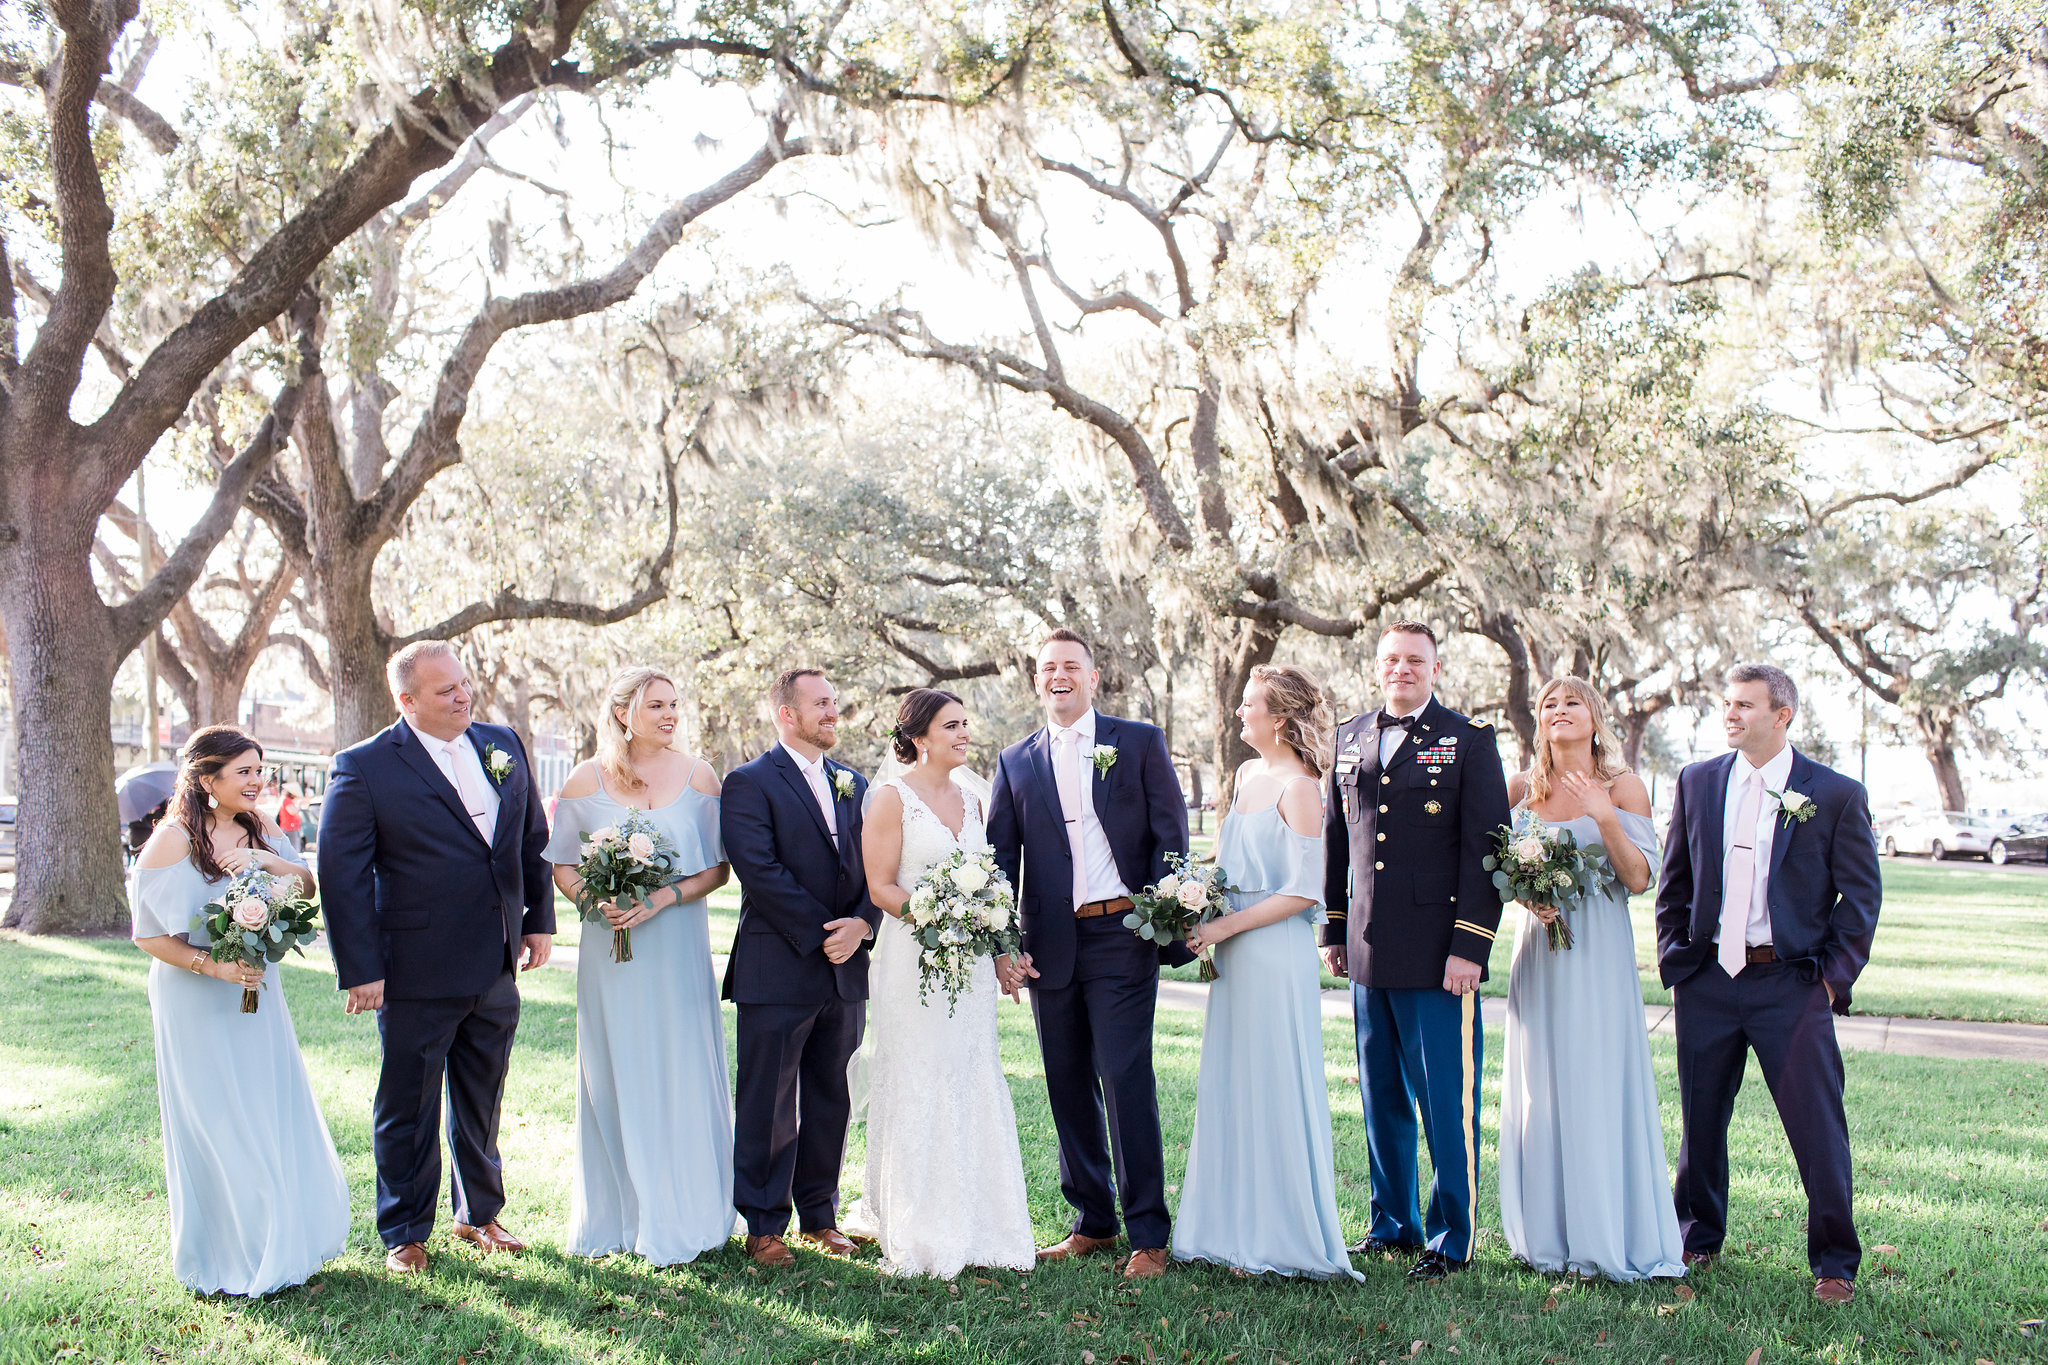 apt-b-photography-Savannah-wedding-photographer-savannah-engagement-photographer-historic-savannah-engagement-charles-h-morris-center-wedding-savannah-weddings-2720.JPG